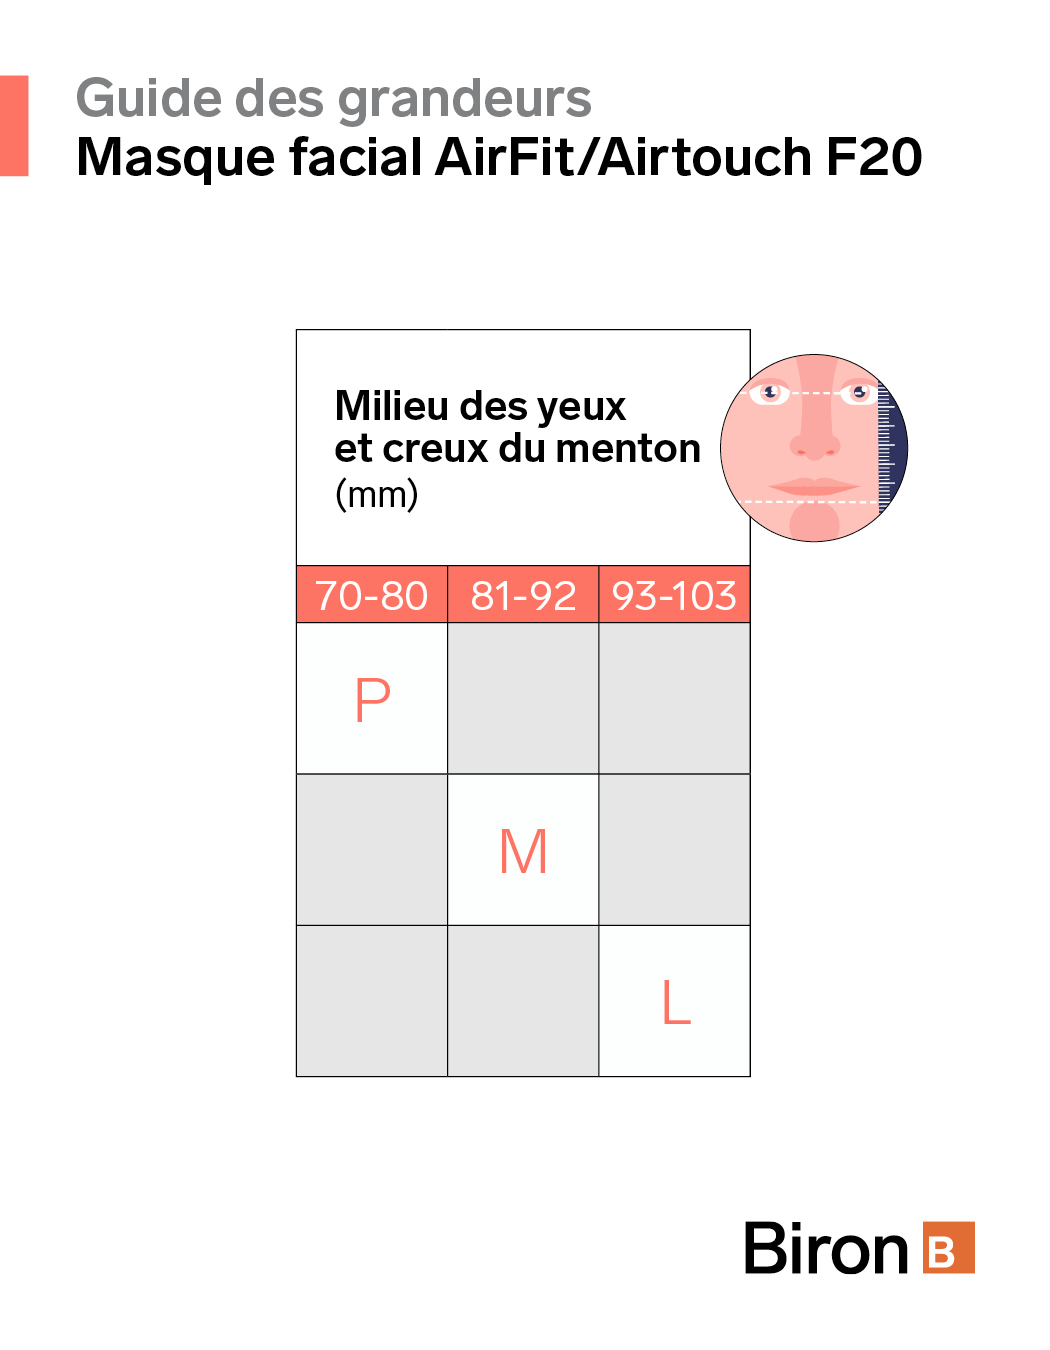 Gabarit grandeur Masque facial AirFit F20